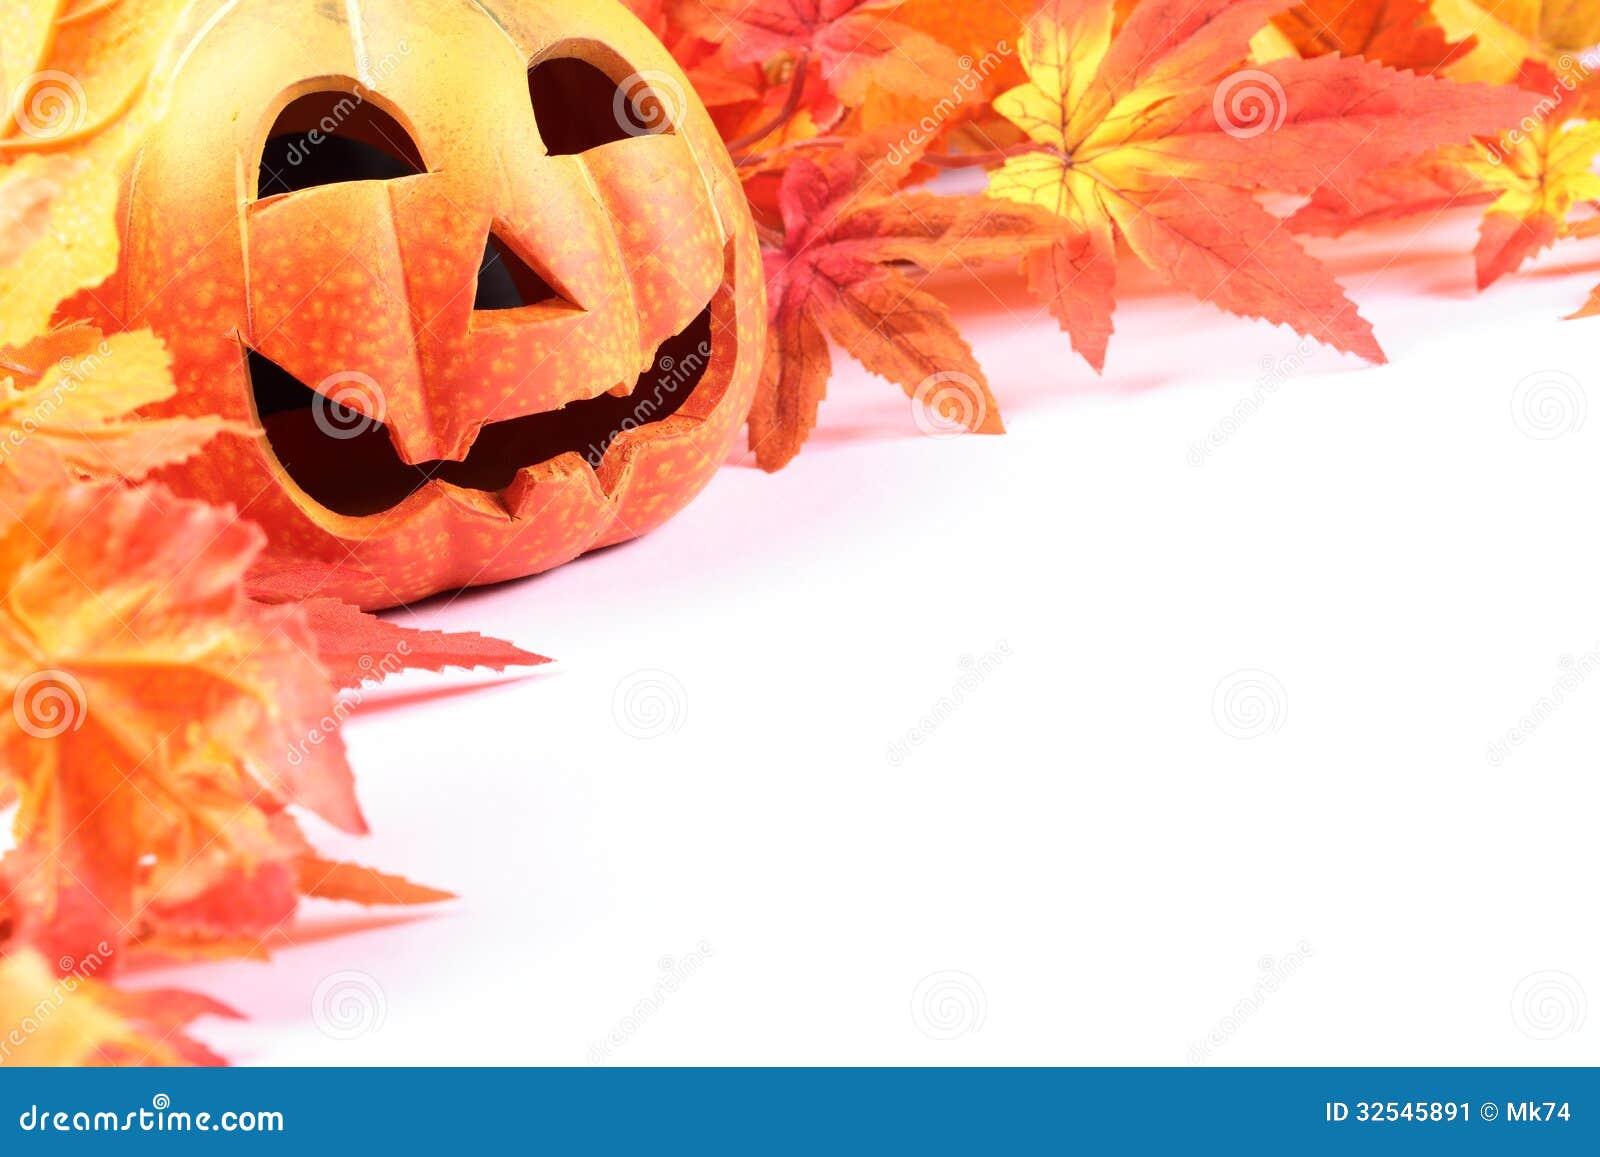 Halloween Background Stock Image - Image: 32545891